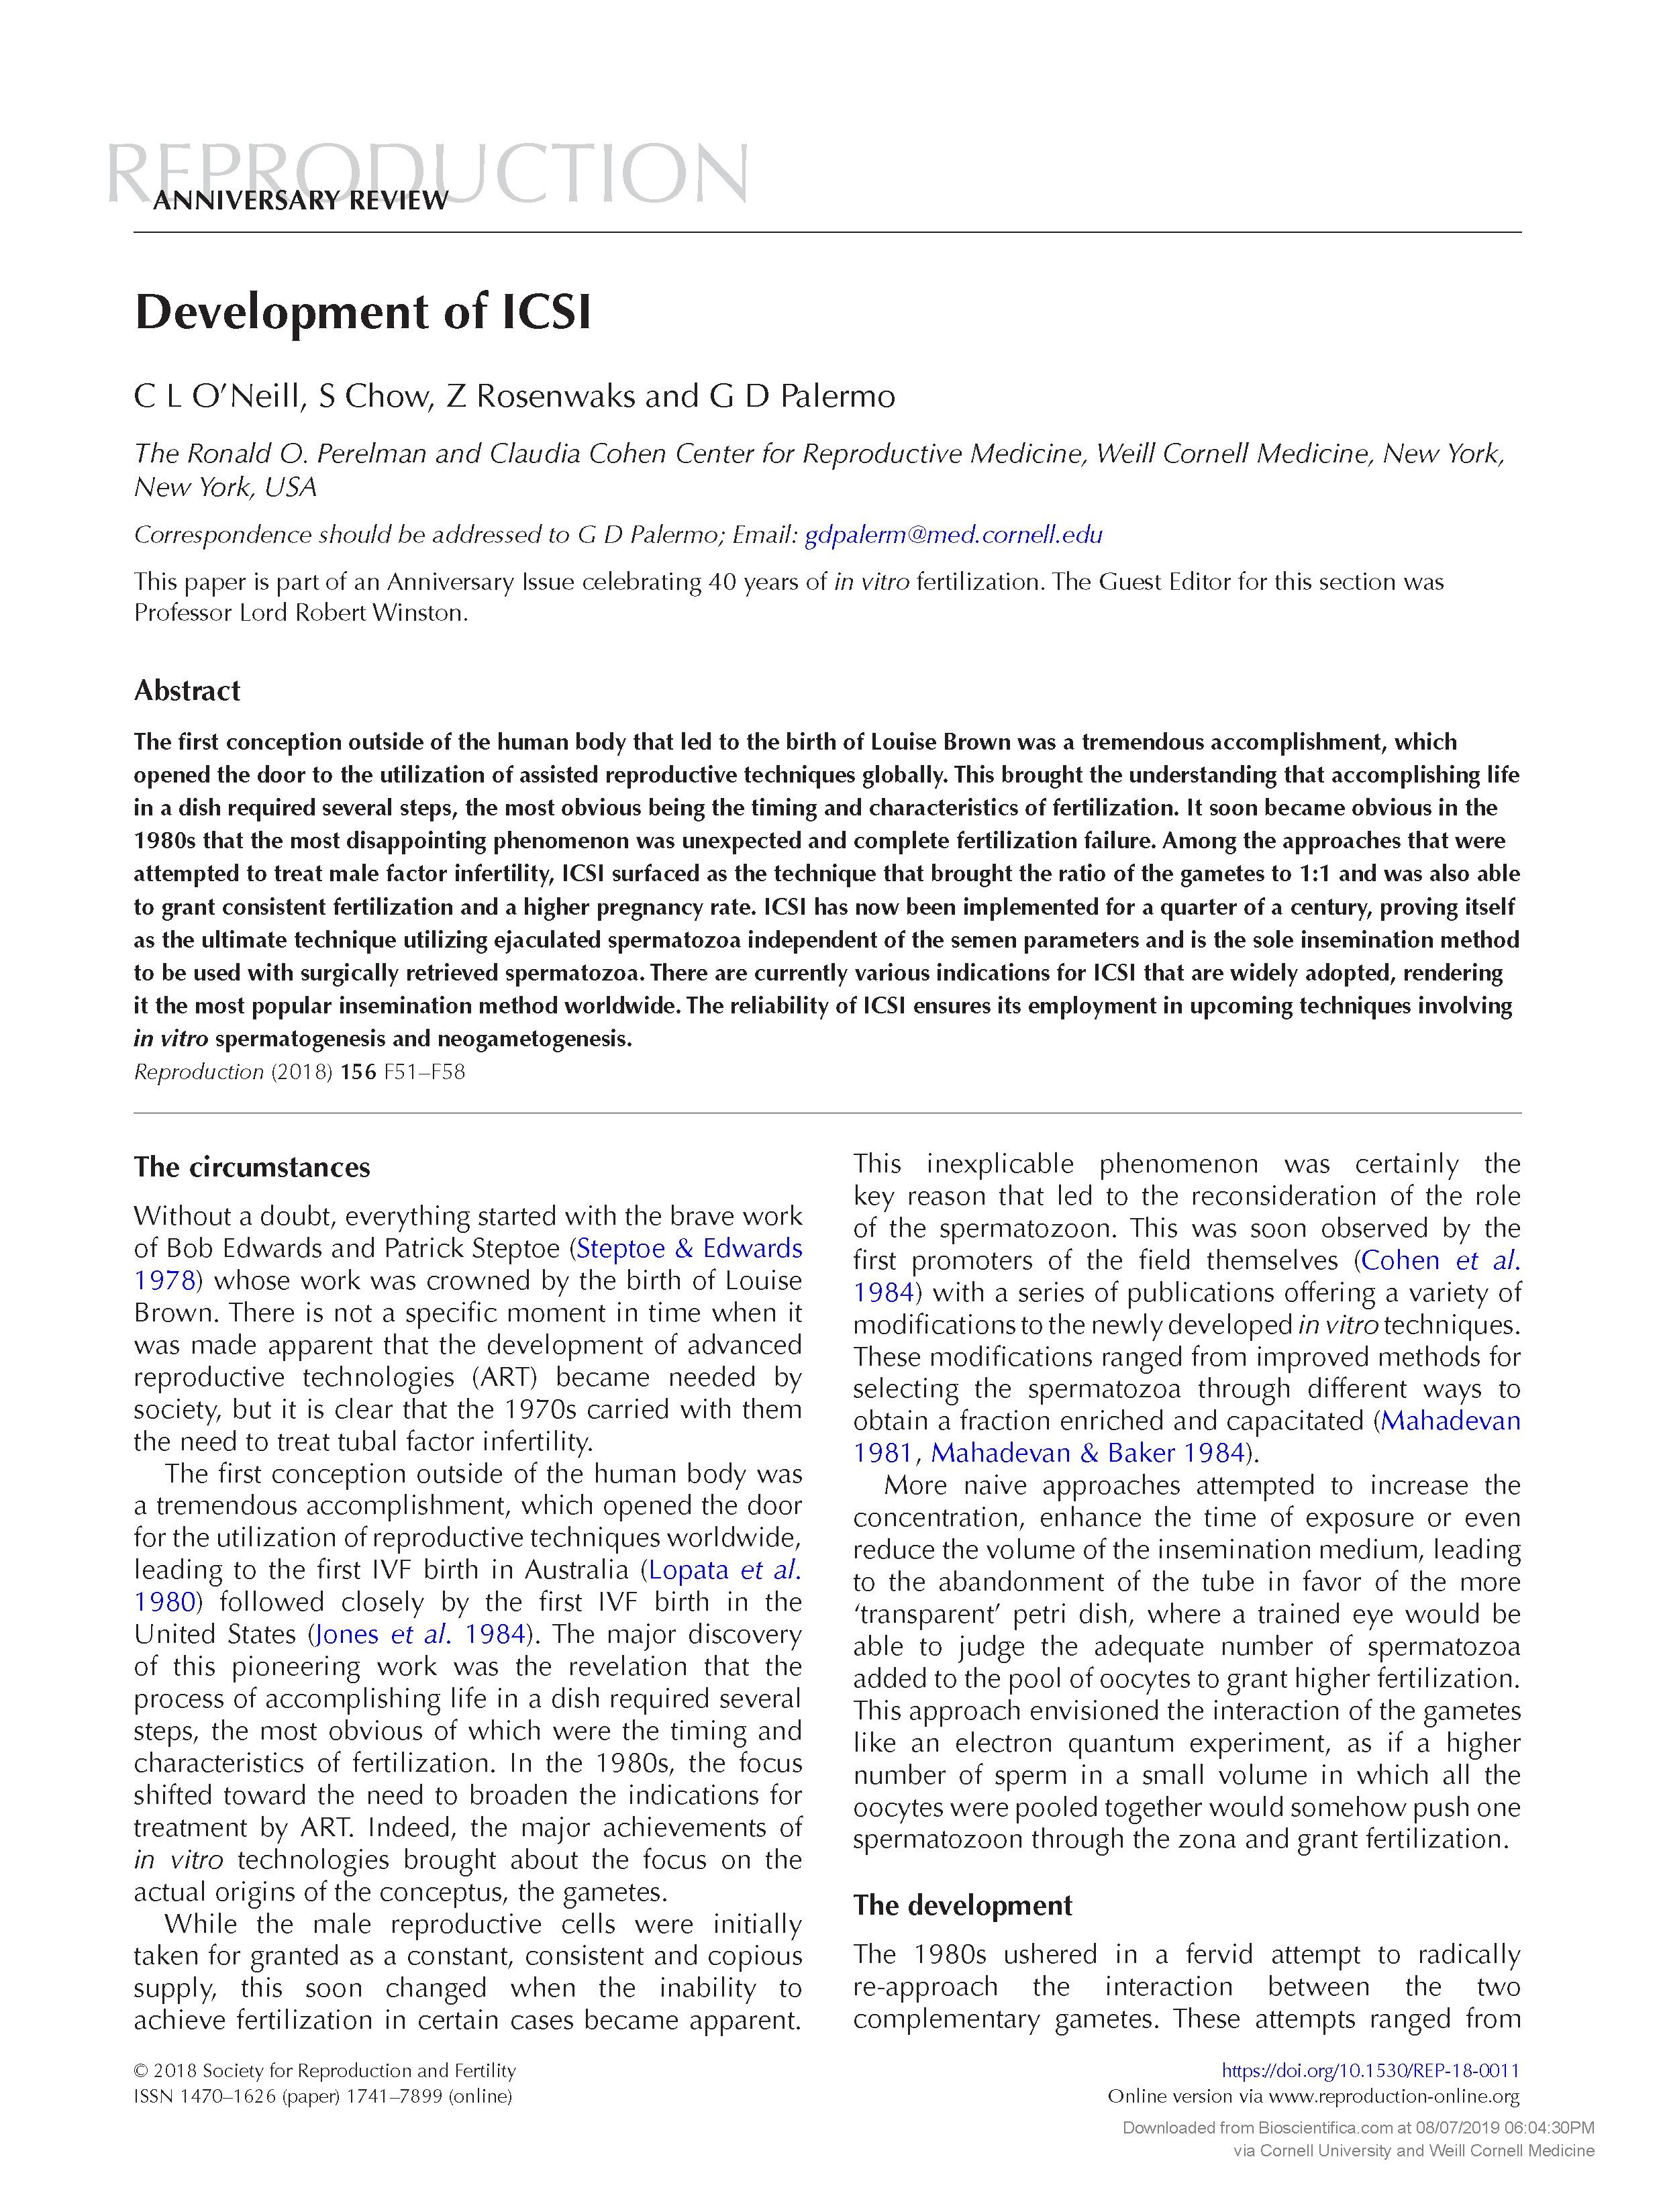 Dev+of+ICSI.jpg